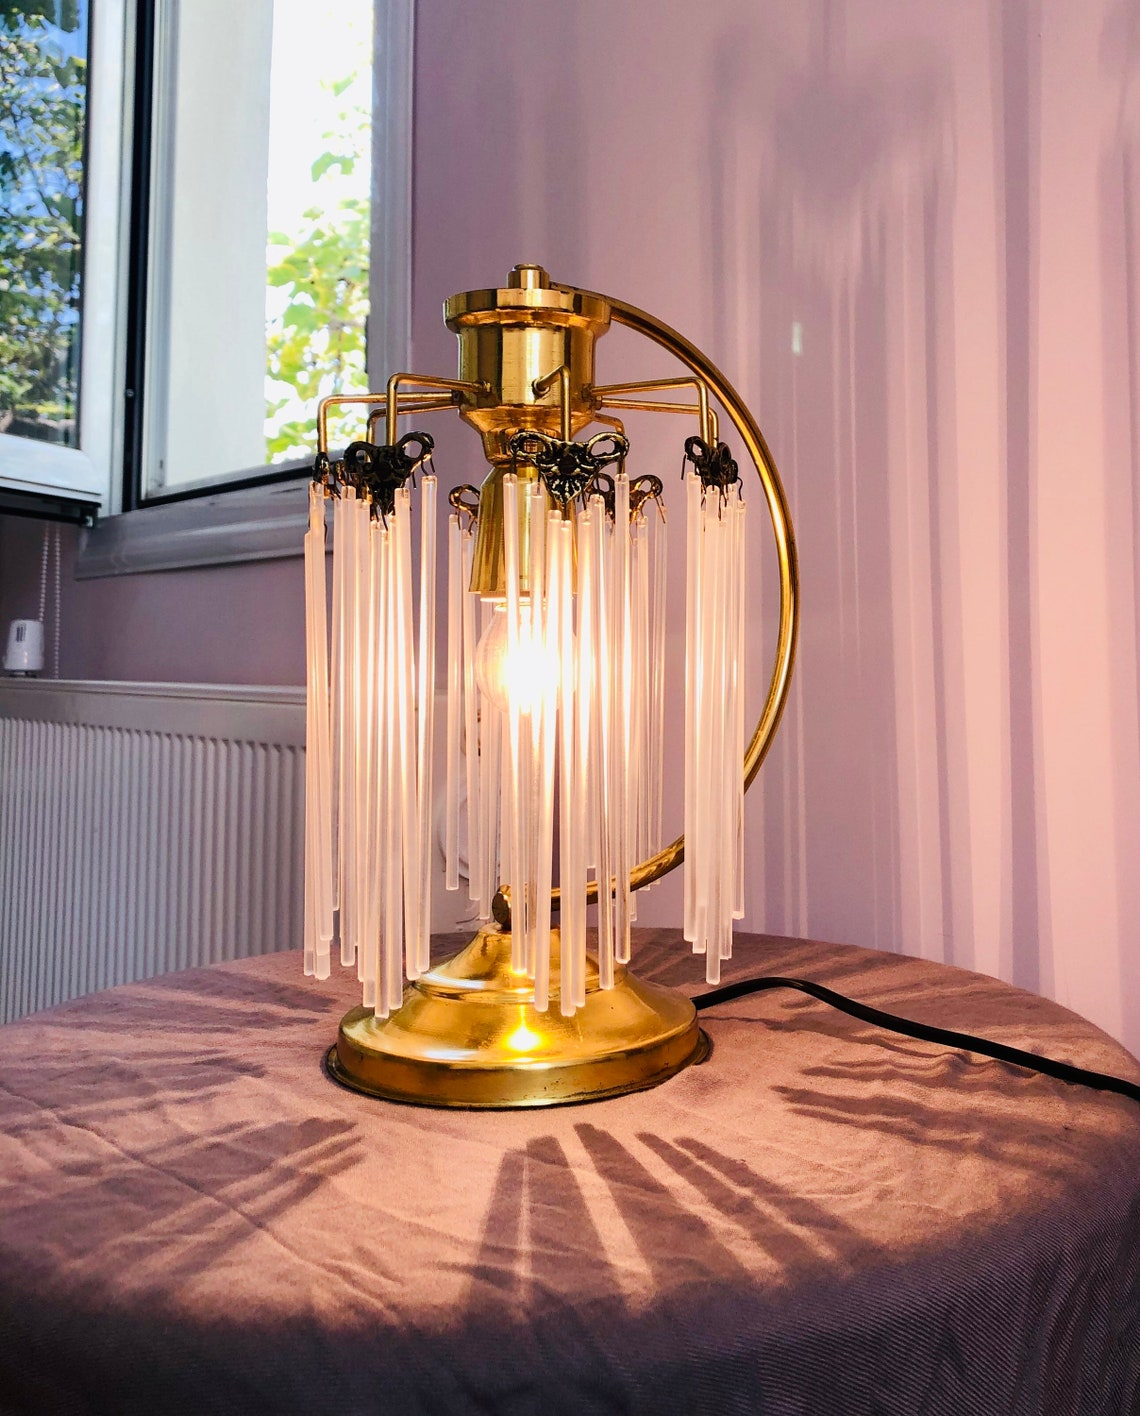 Vintage Murano Glass Table Lamp Antique Brass  Art Deco Retro Dining room  Bathroom Bedroom Indoor Light Shade Fixture 1980's